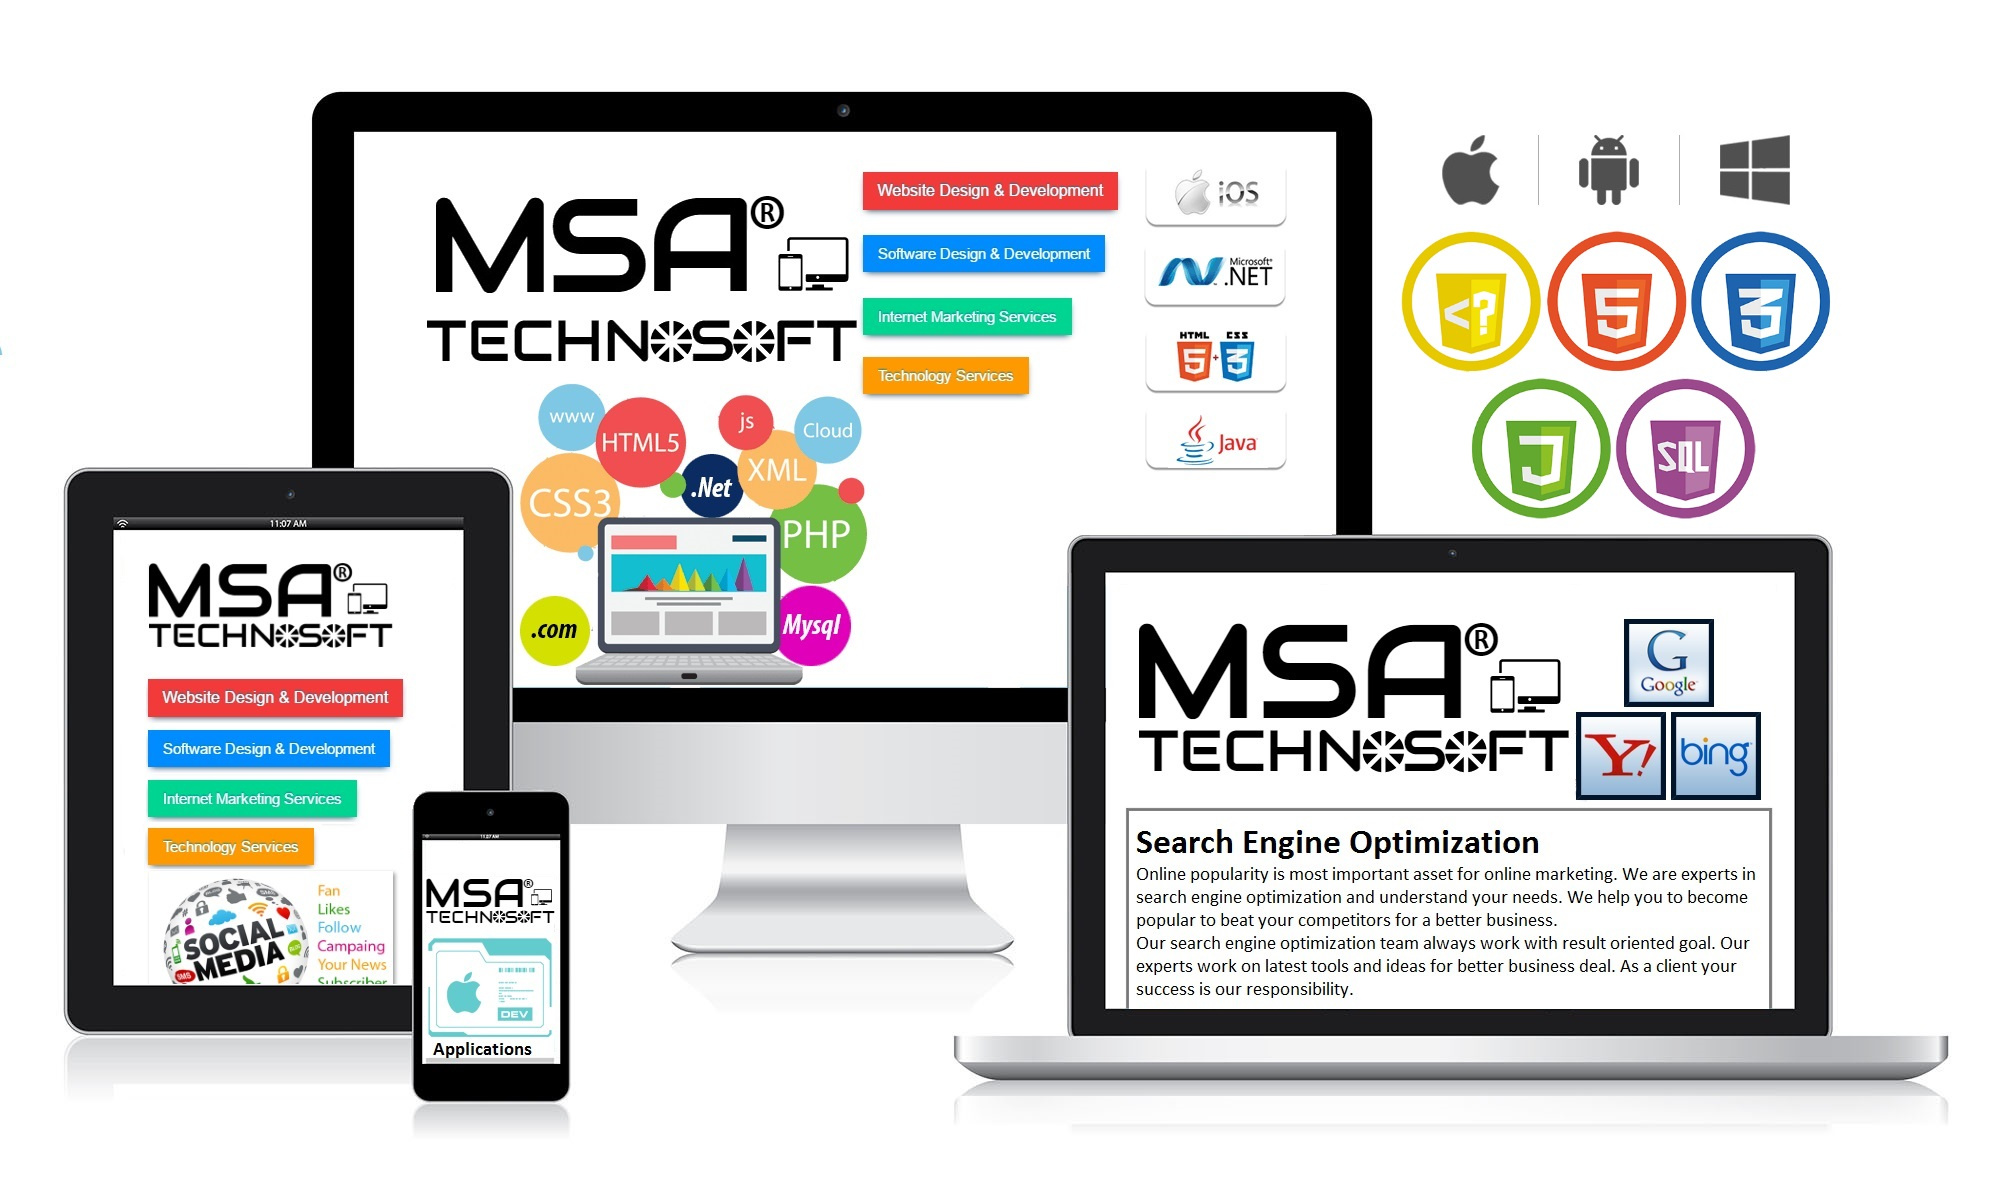 web design and development at MSA Technosoft